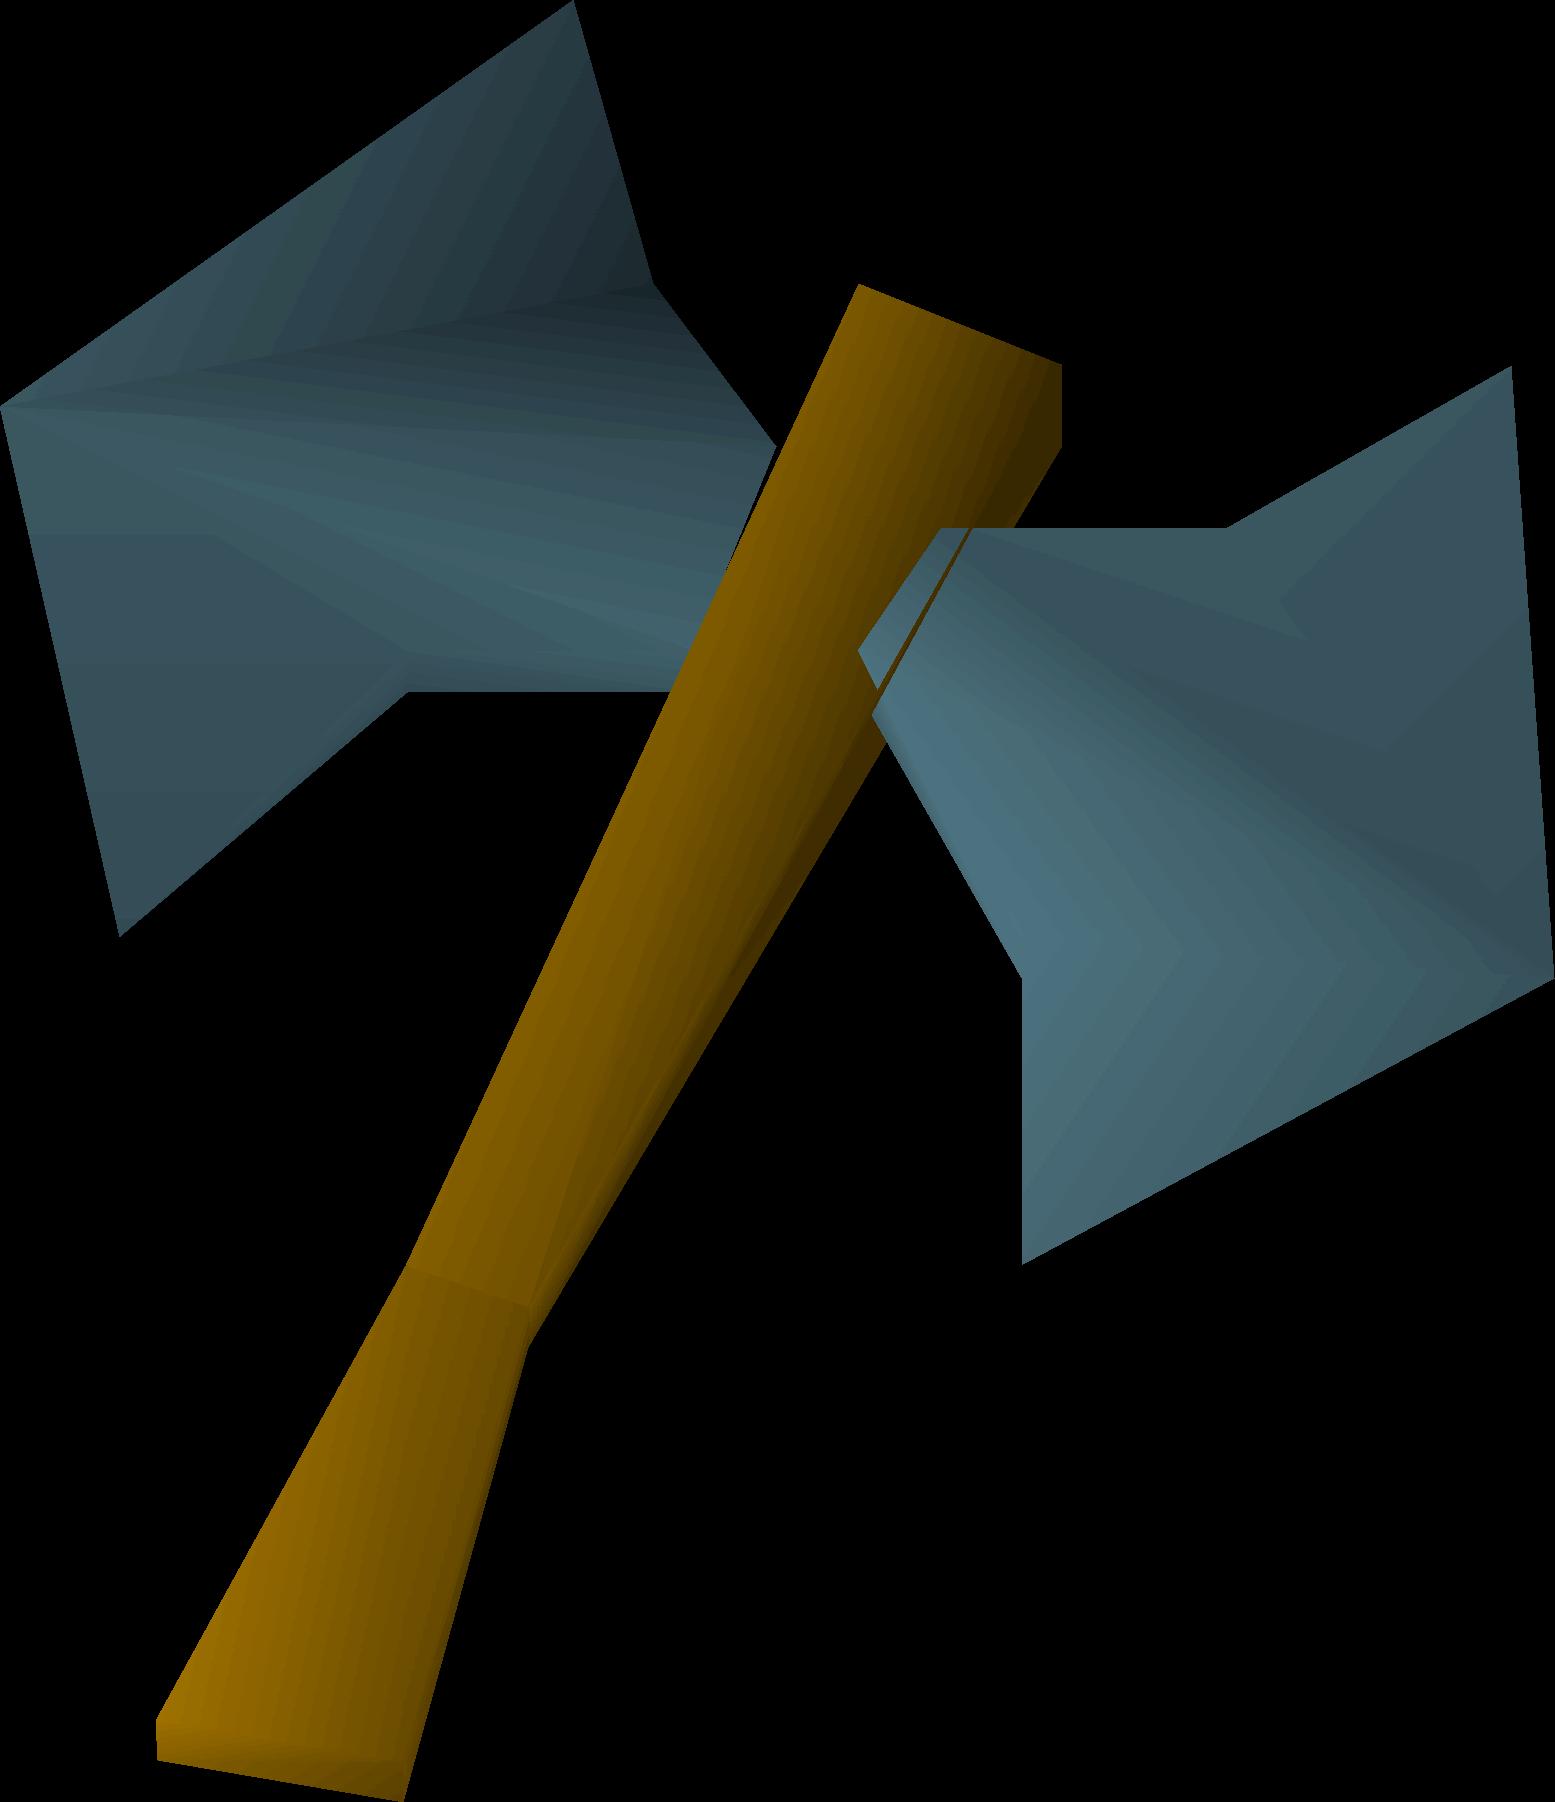 Rune thrownaxe